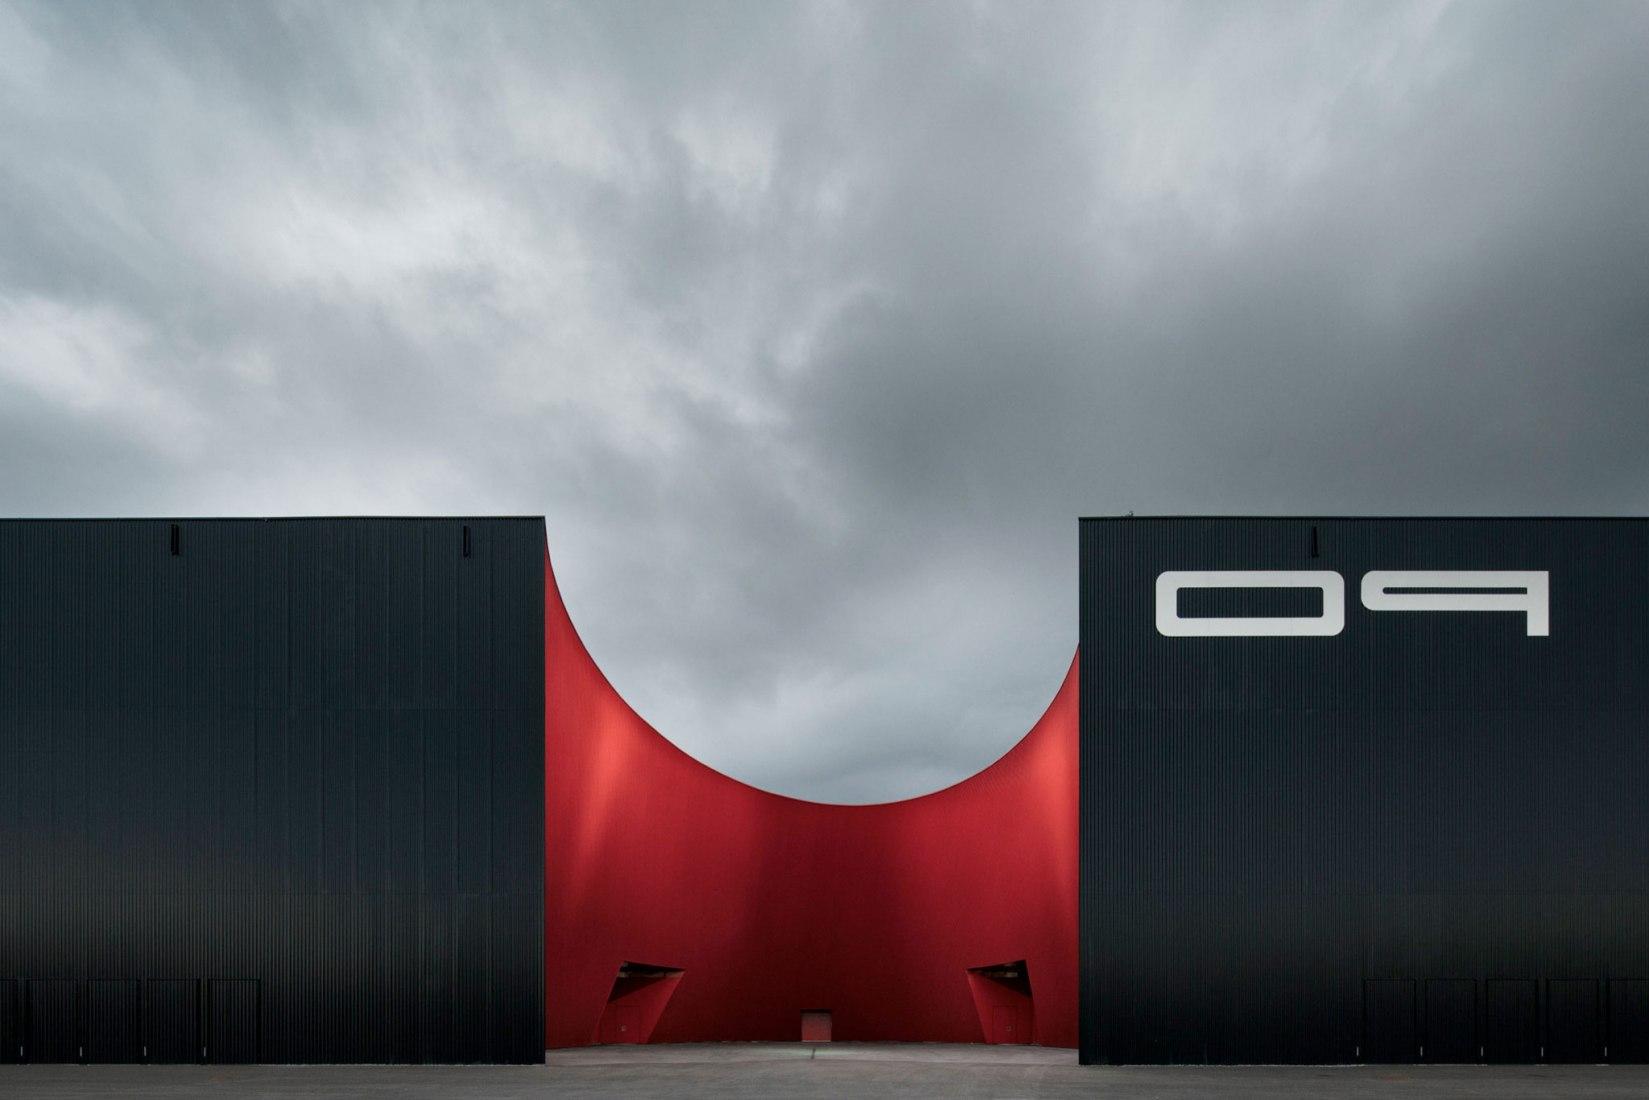 Centro de exposiciones Messe Dornbirn por Marte.Marte Architects. Fotografía © Zumtobel / Faruk Pinjo